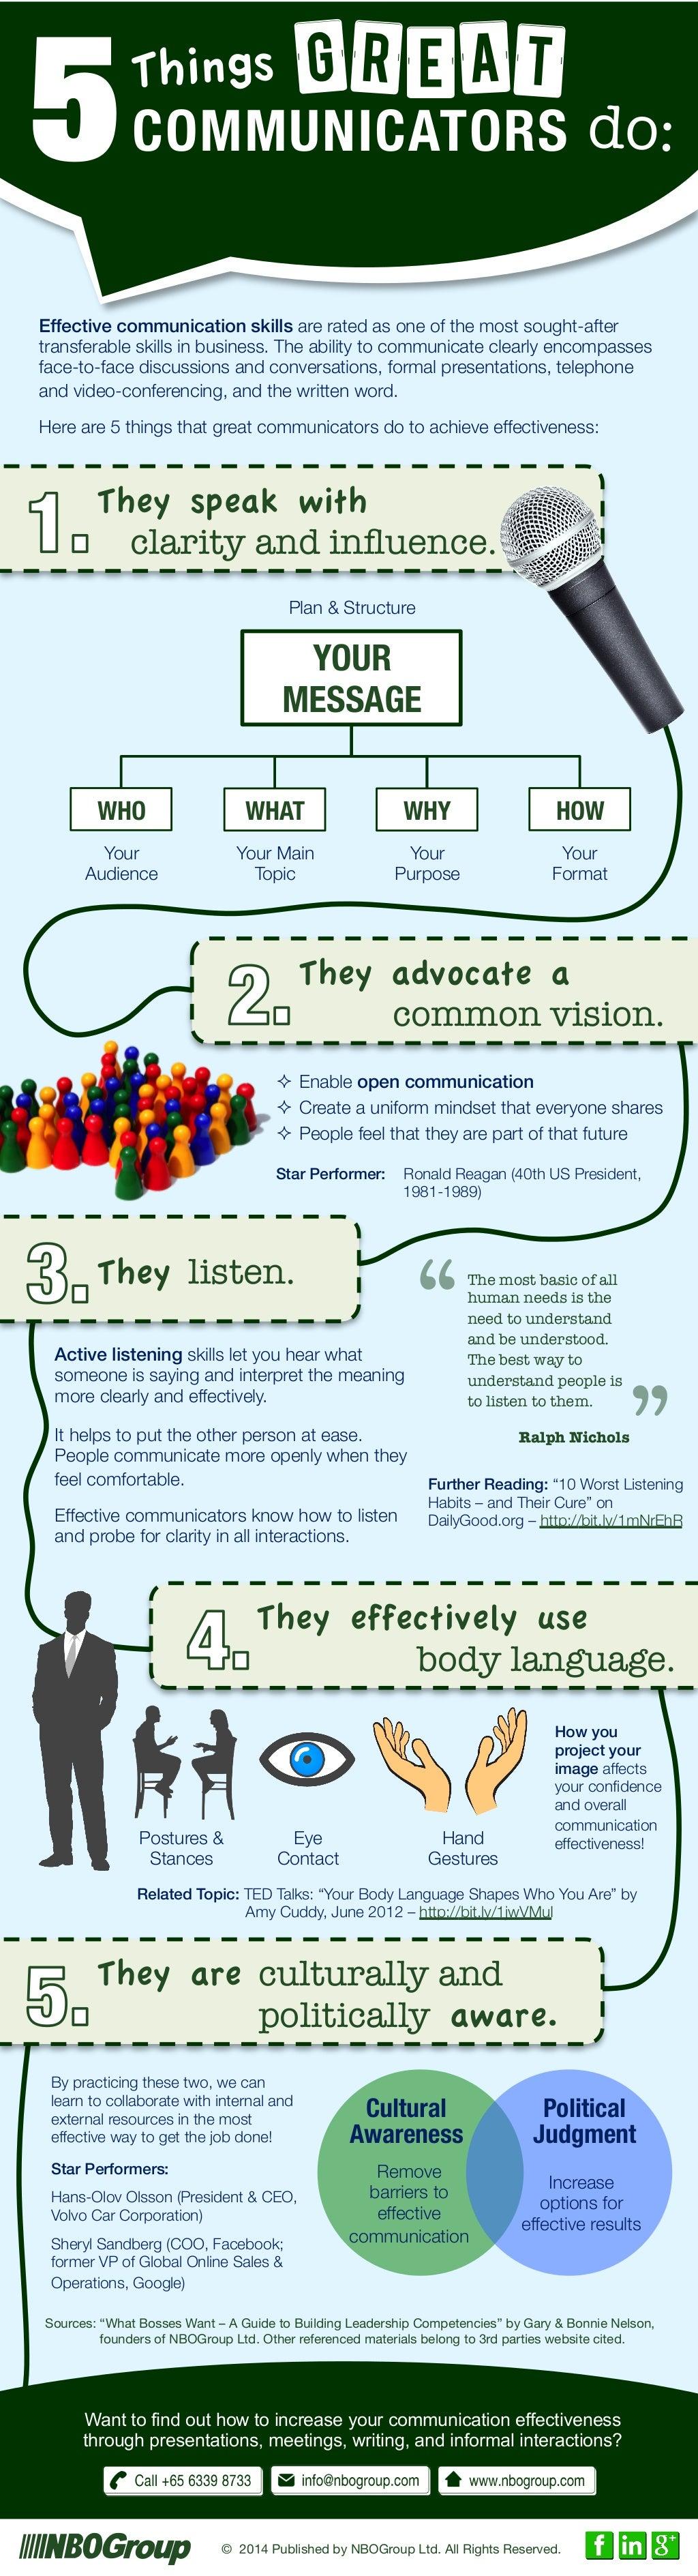 5 Things Great Communicators Do